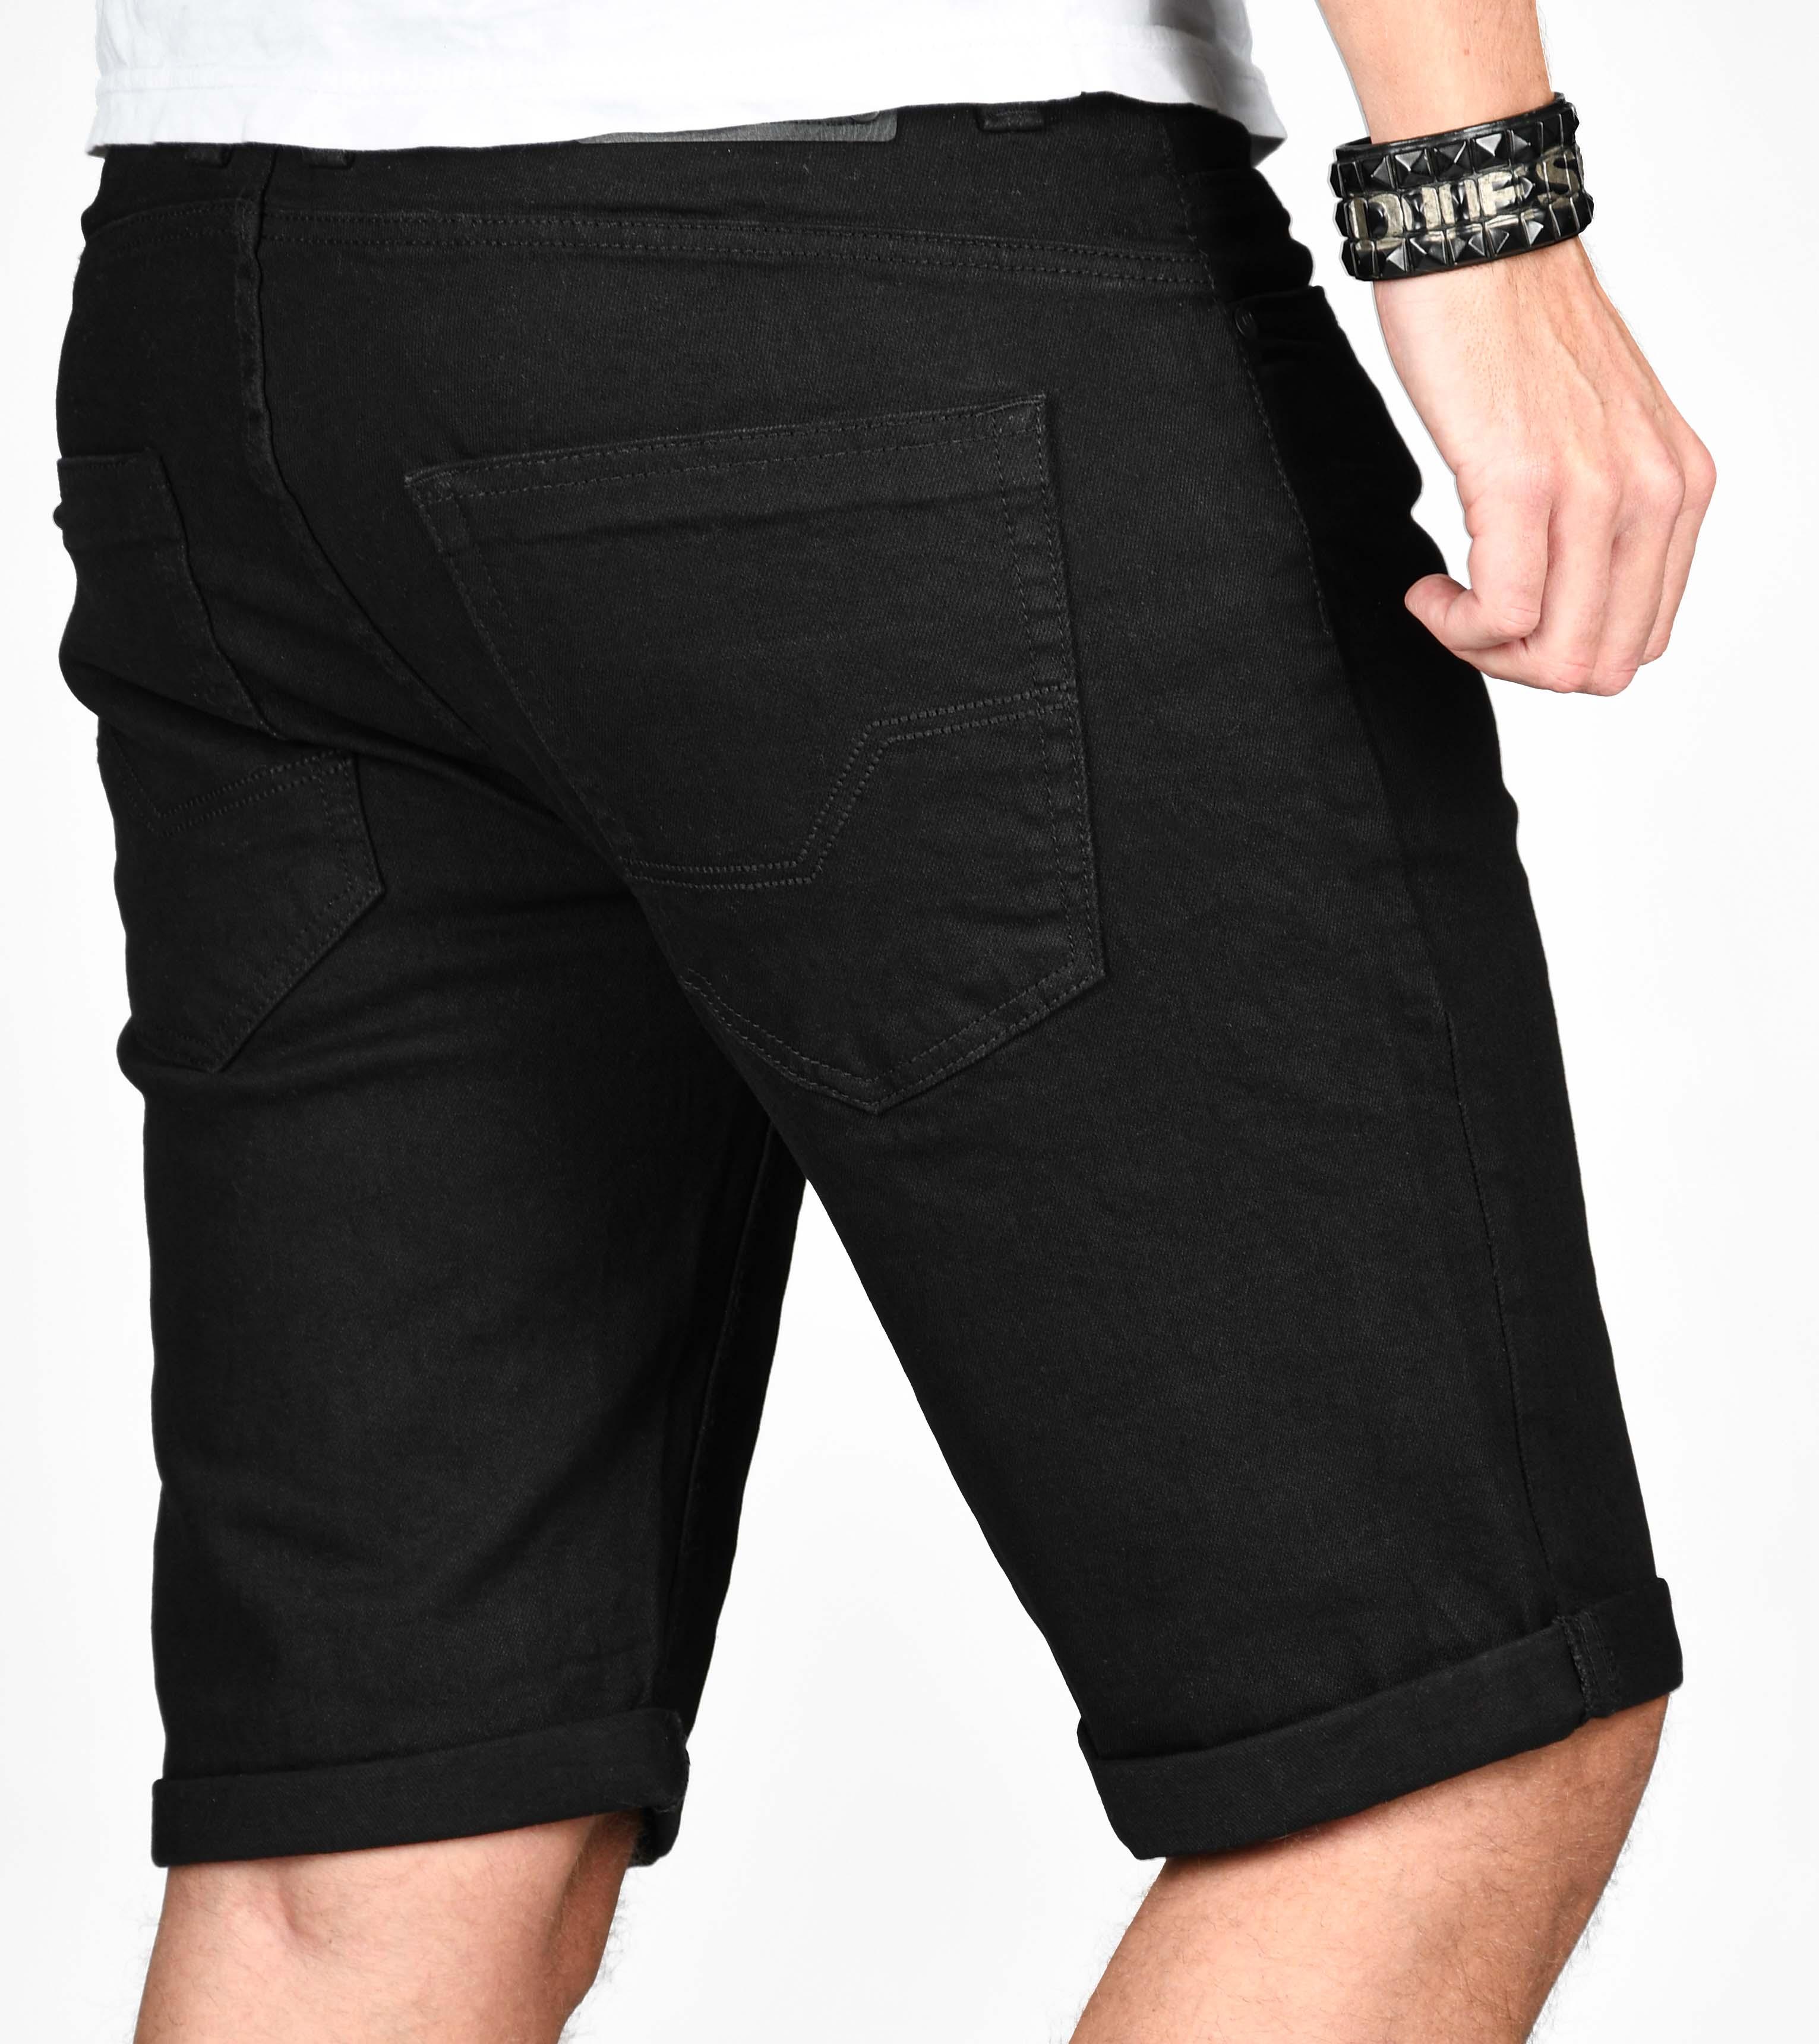 Indicode-Herren-Sommer-Bermuda-Jeans-Shorts-kurze-Hose-Sommerhose-Short-Neu-B556 Indexbild 8